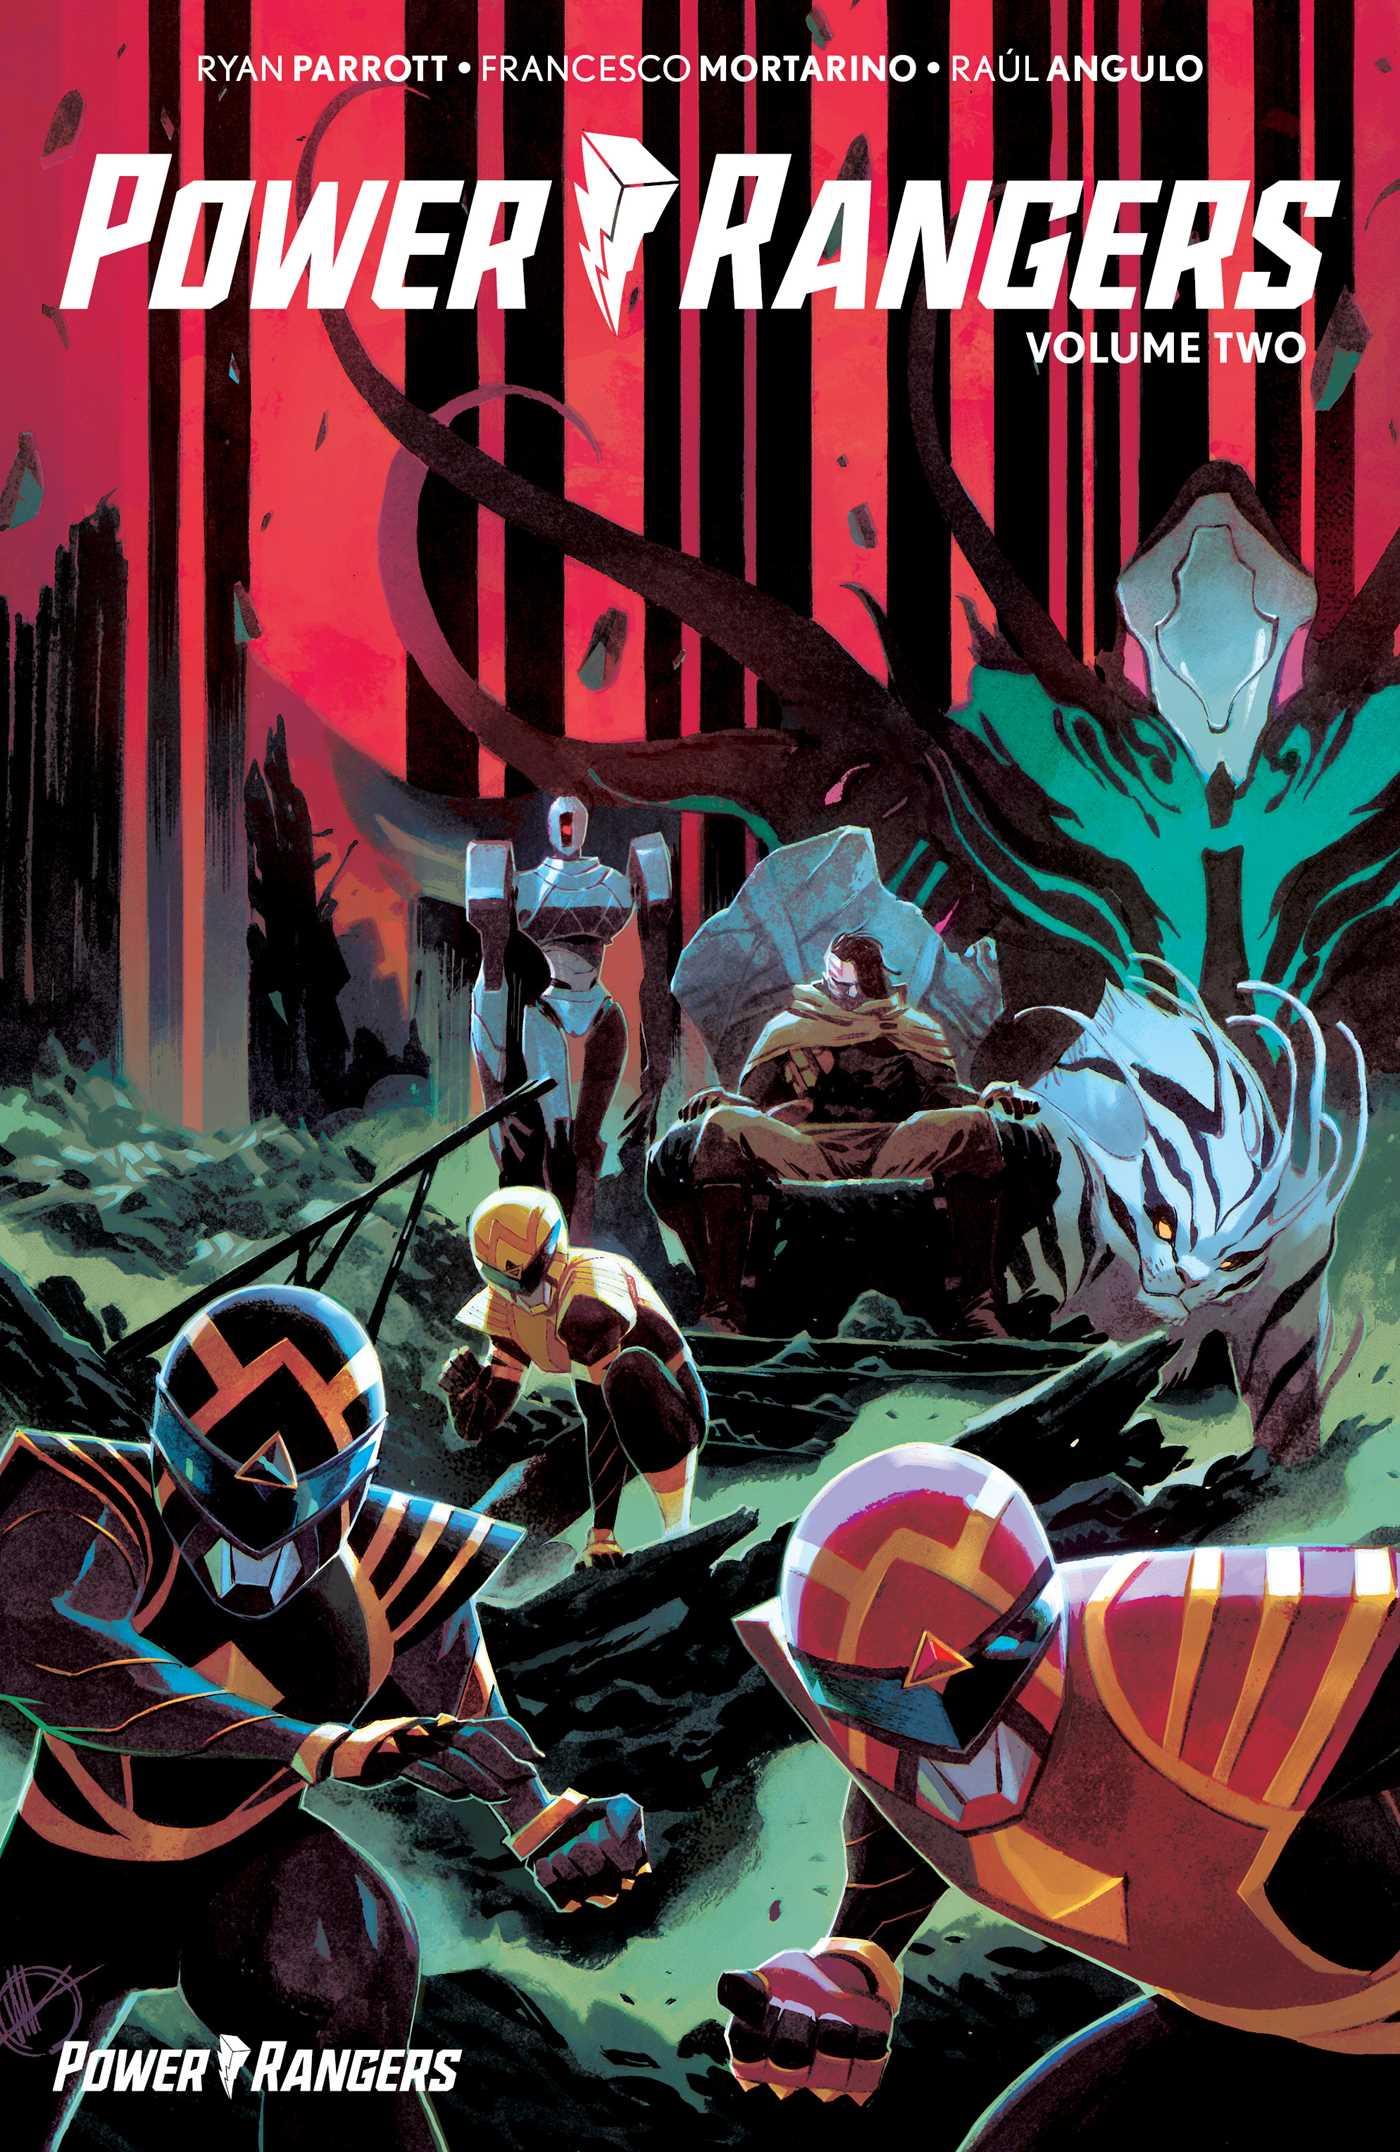 Power Rangers, Vol. 2